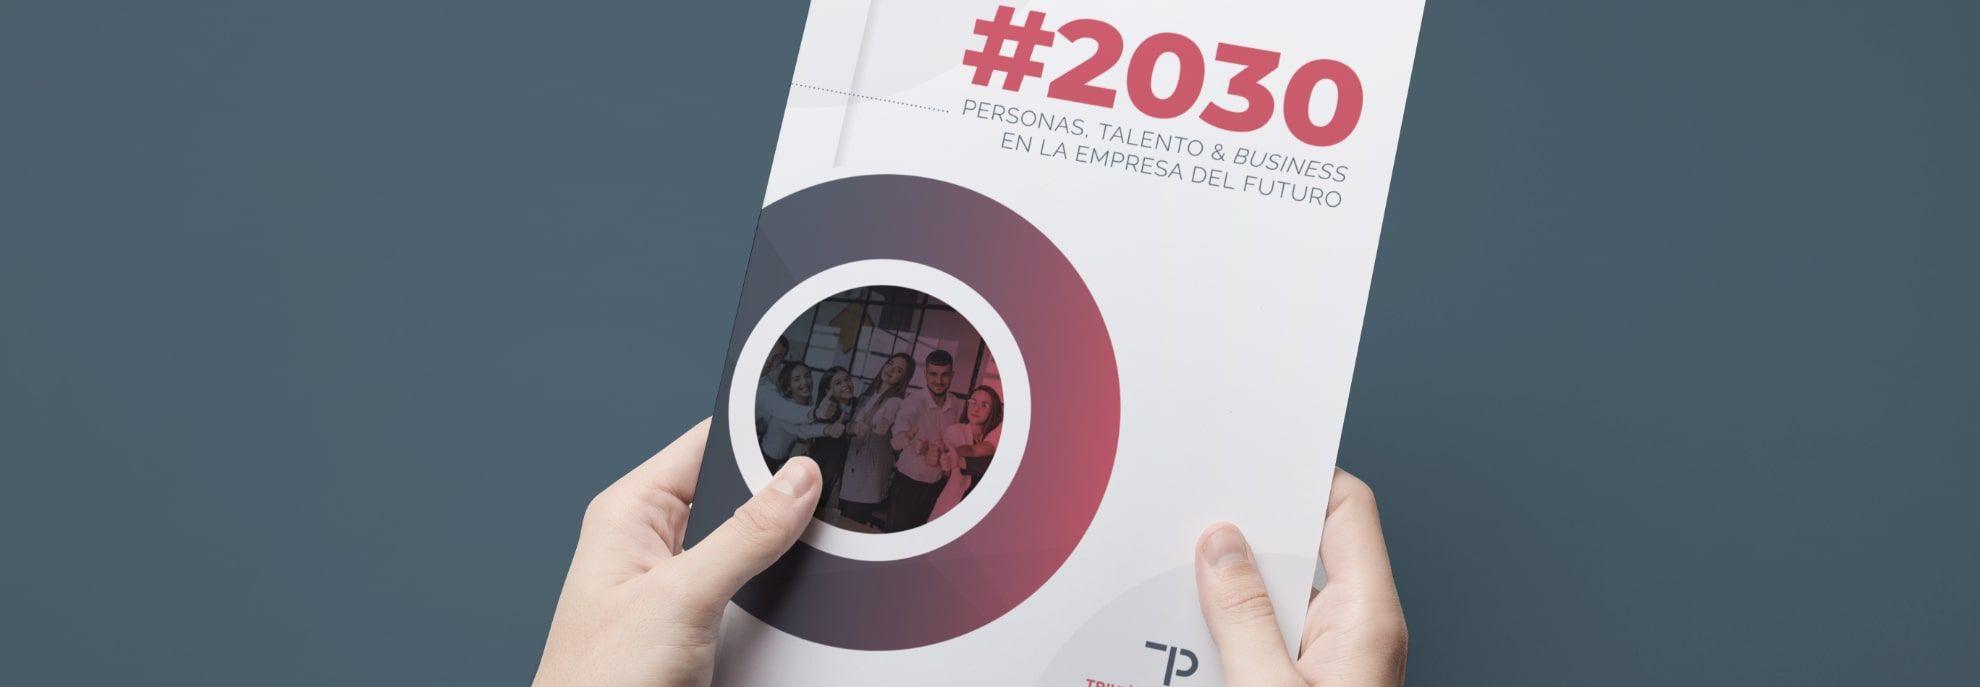 Imagen del informe 2030 sobre R.R.H.H.